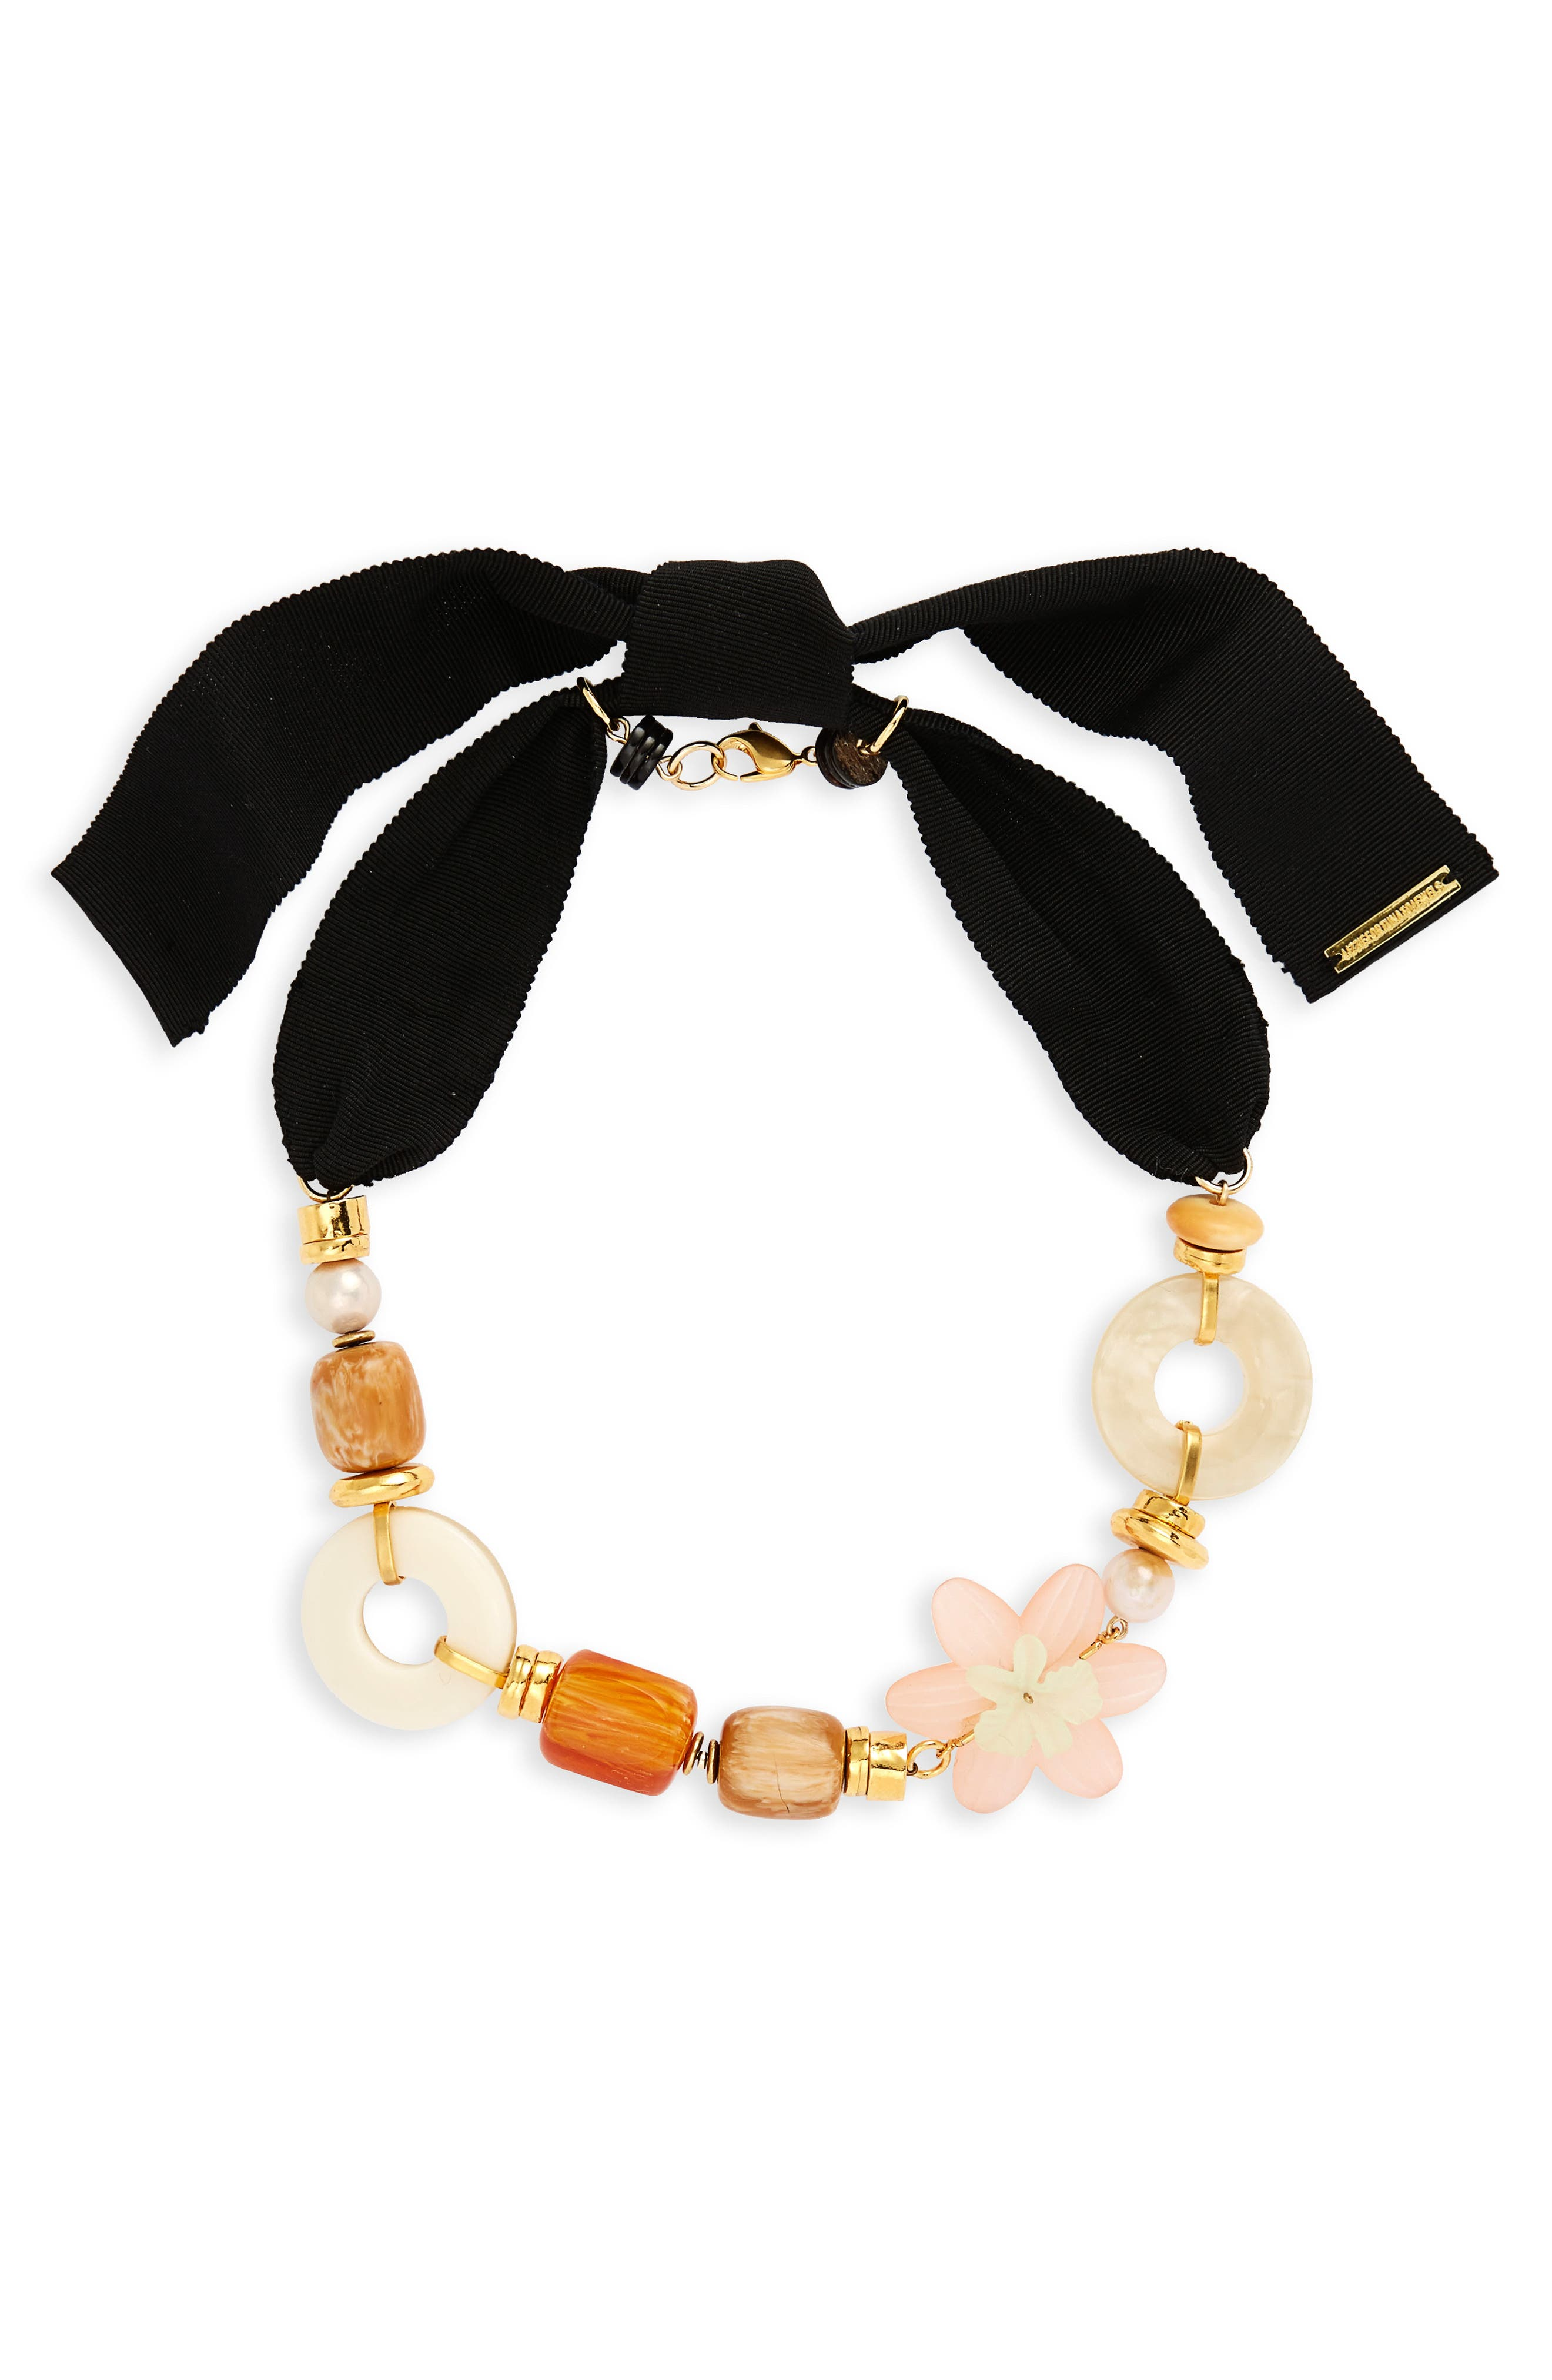 Lizzie Fortunato Go-Go Necklace